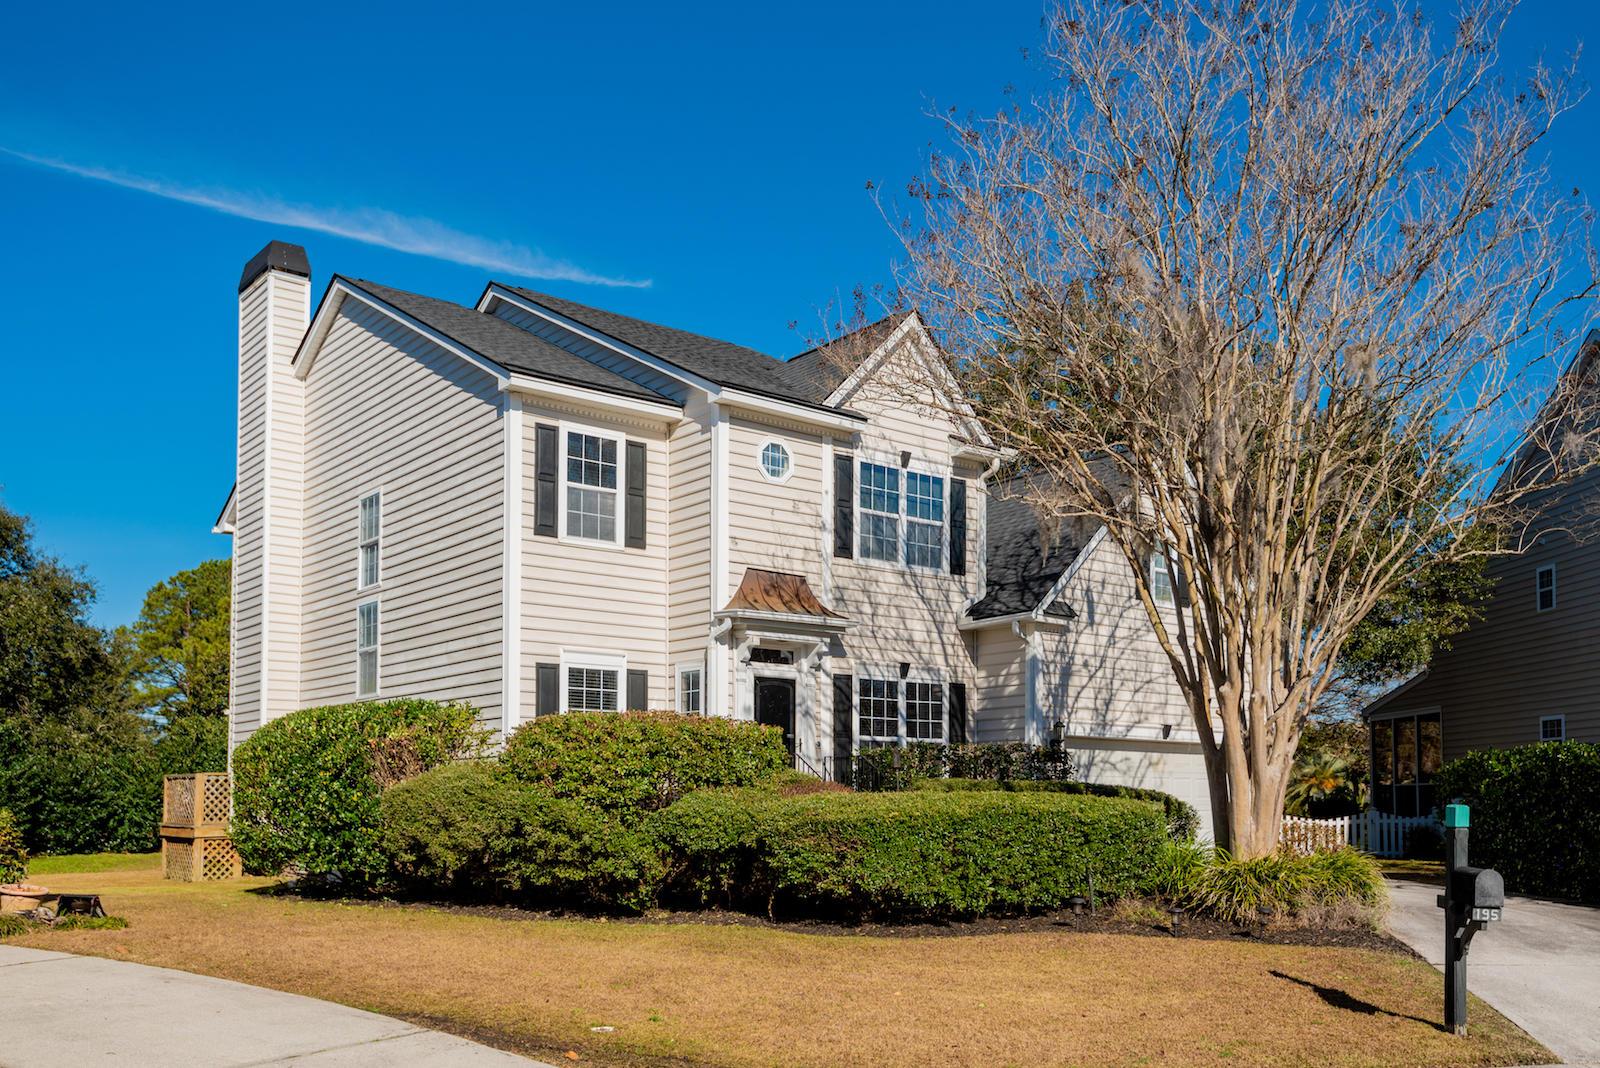 Belle Hall Homes For Sale - 195 Revetment, Mount Pleasant, SC - 2